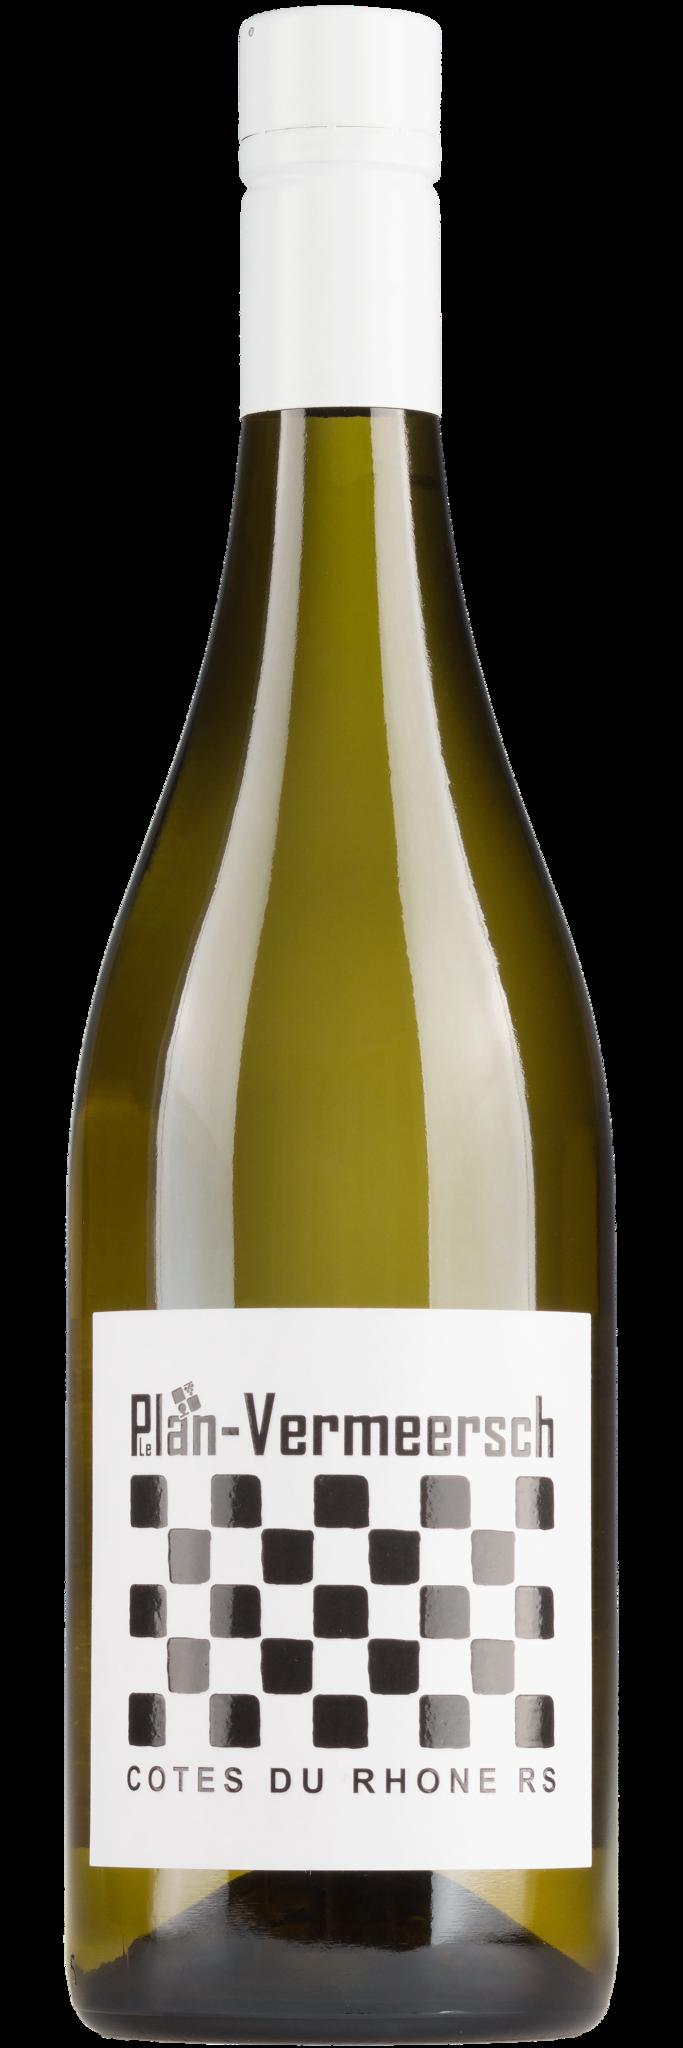 LePlan Vermeesch, Rhône 2020 Côtes-du-Rhône blanc RS, Plan-Vermeersch